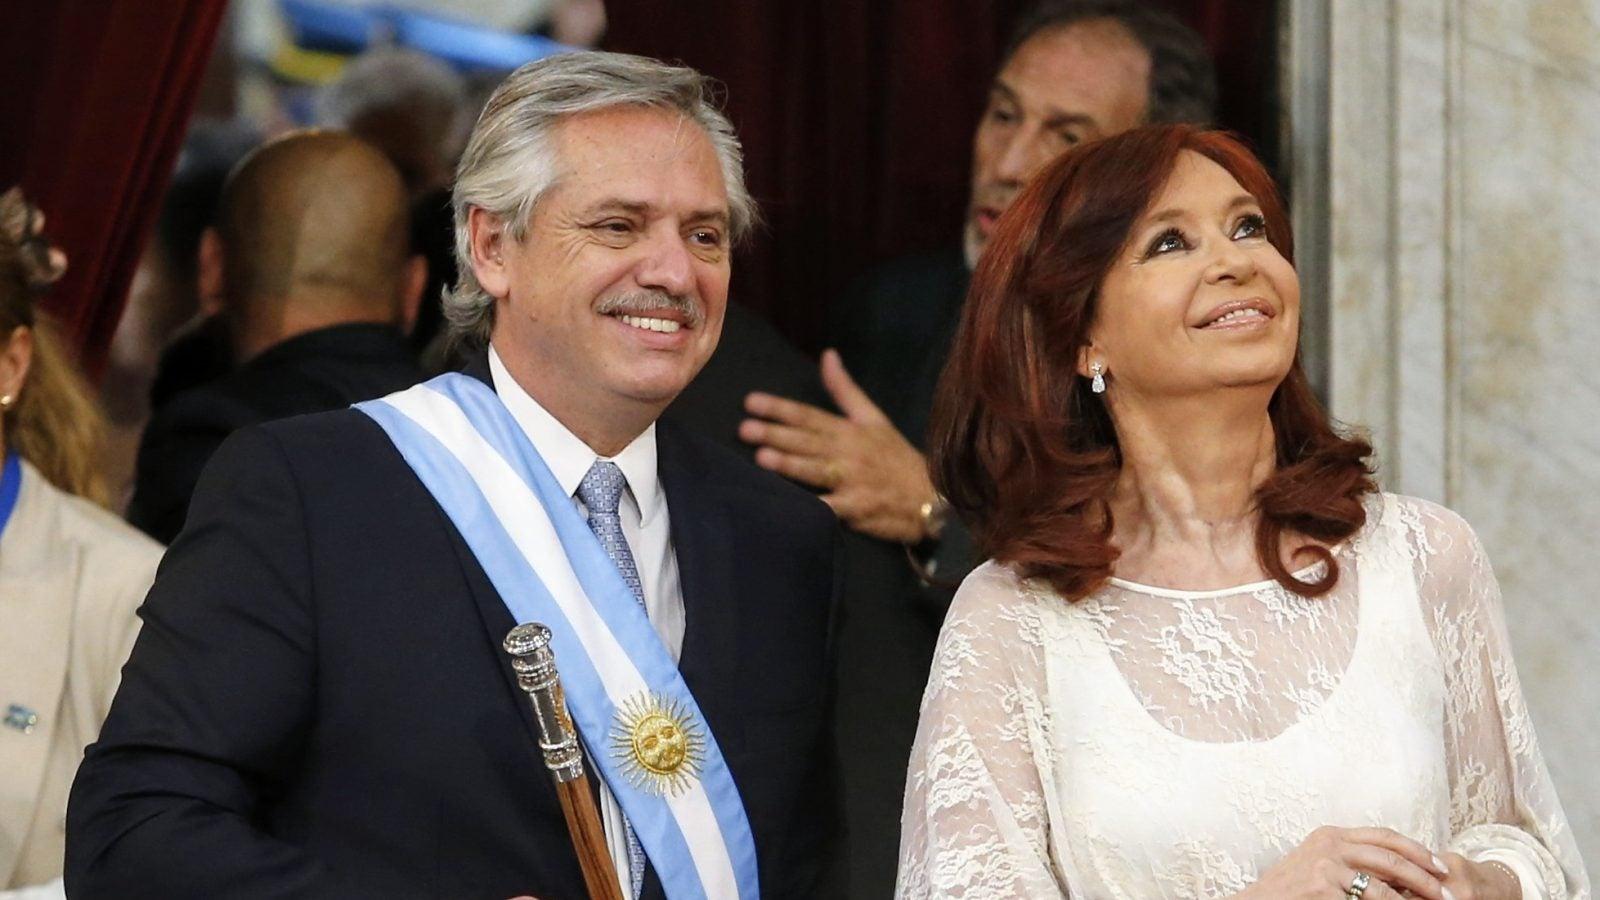 Argentine President Alberto Fernandez